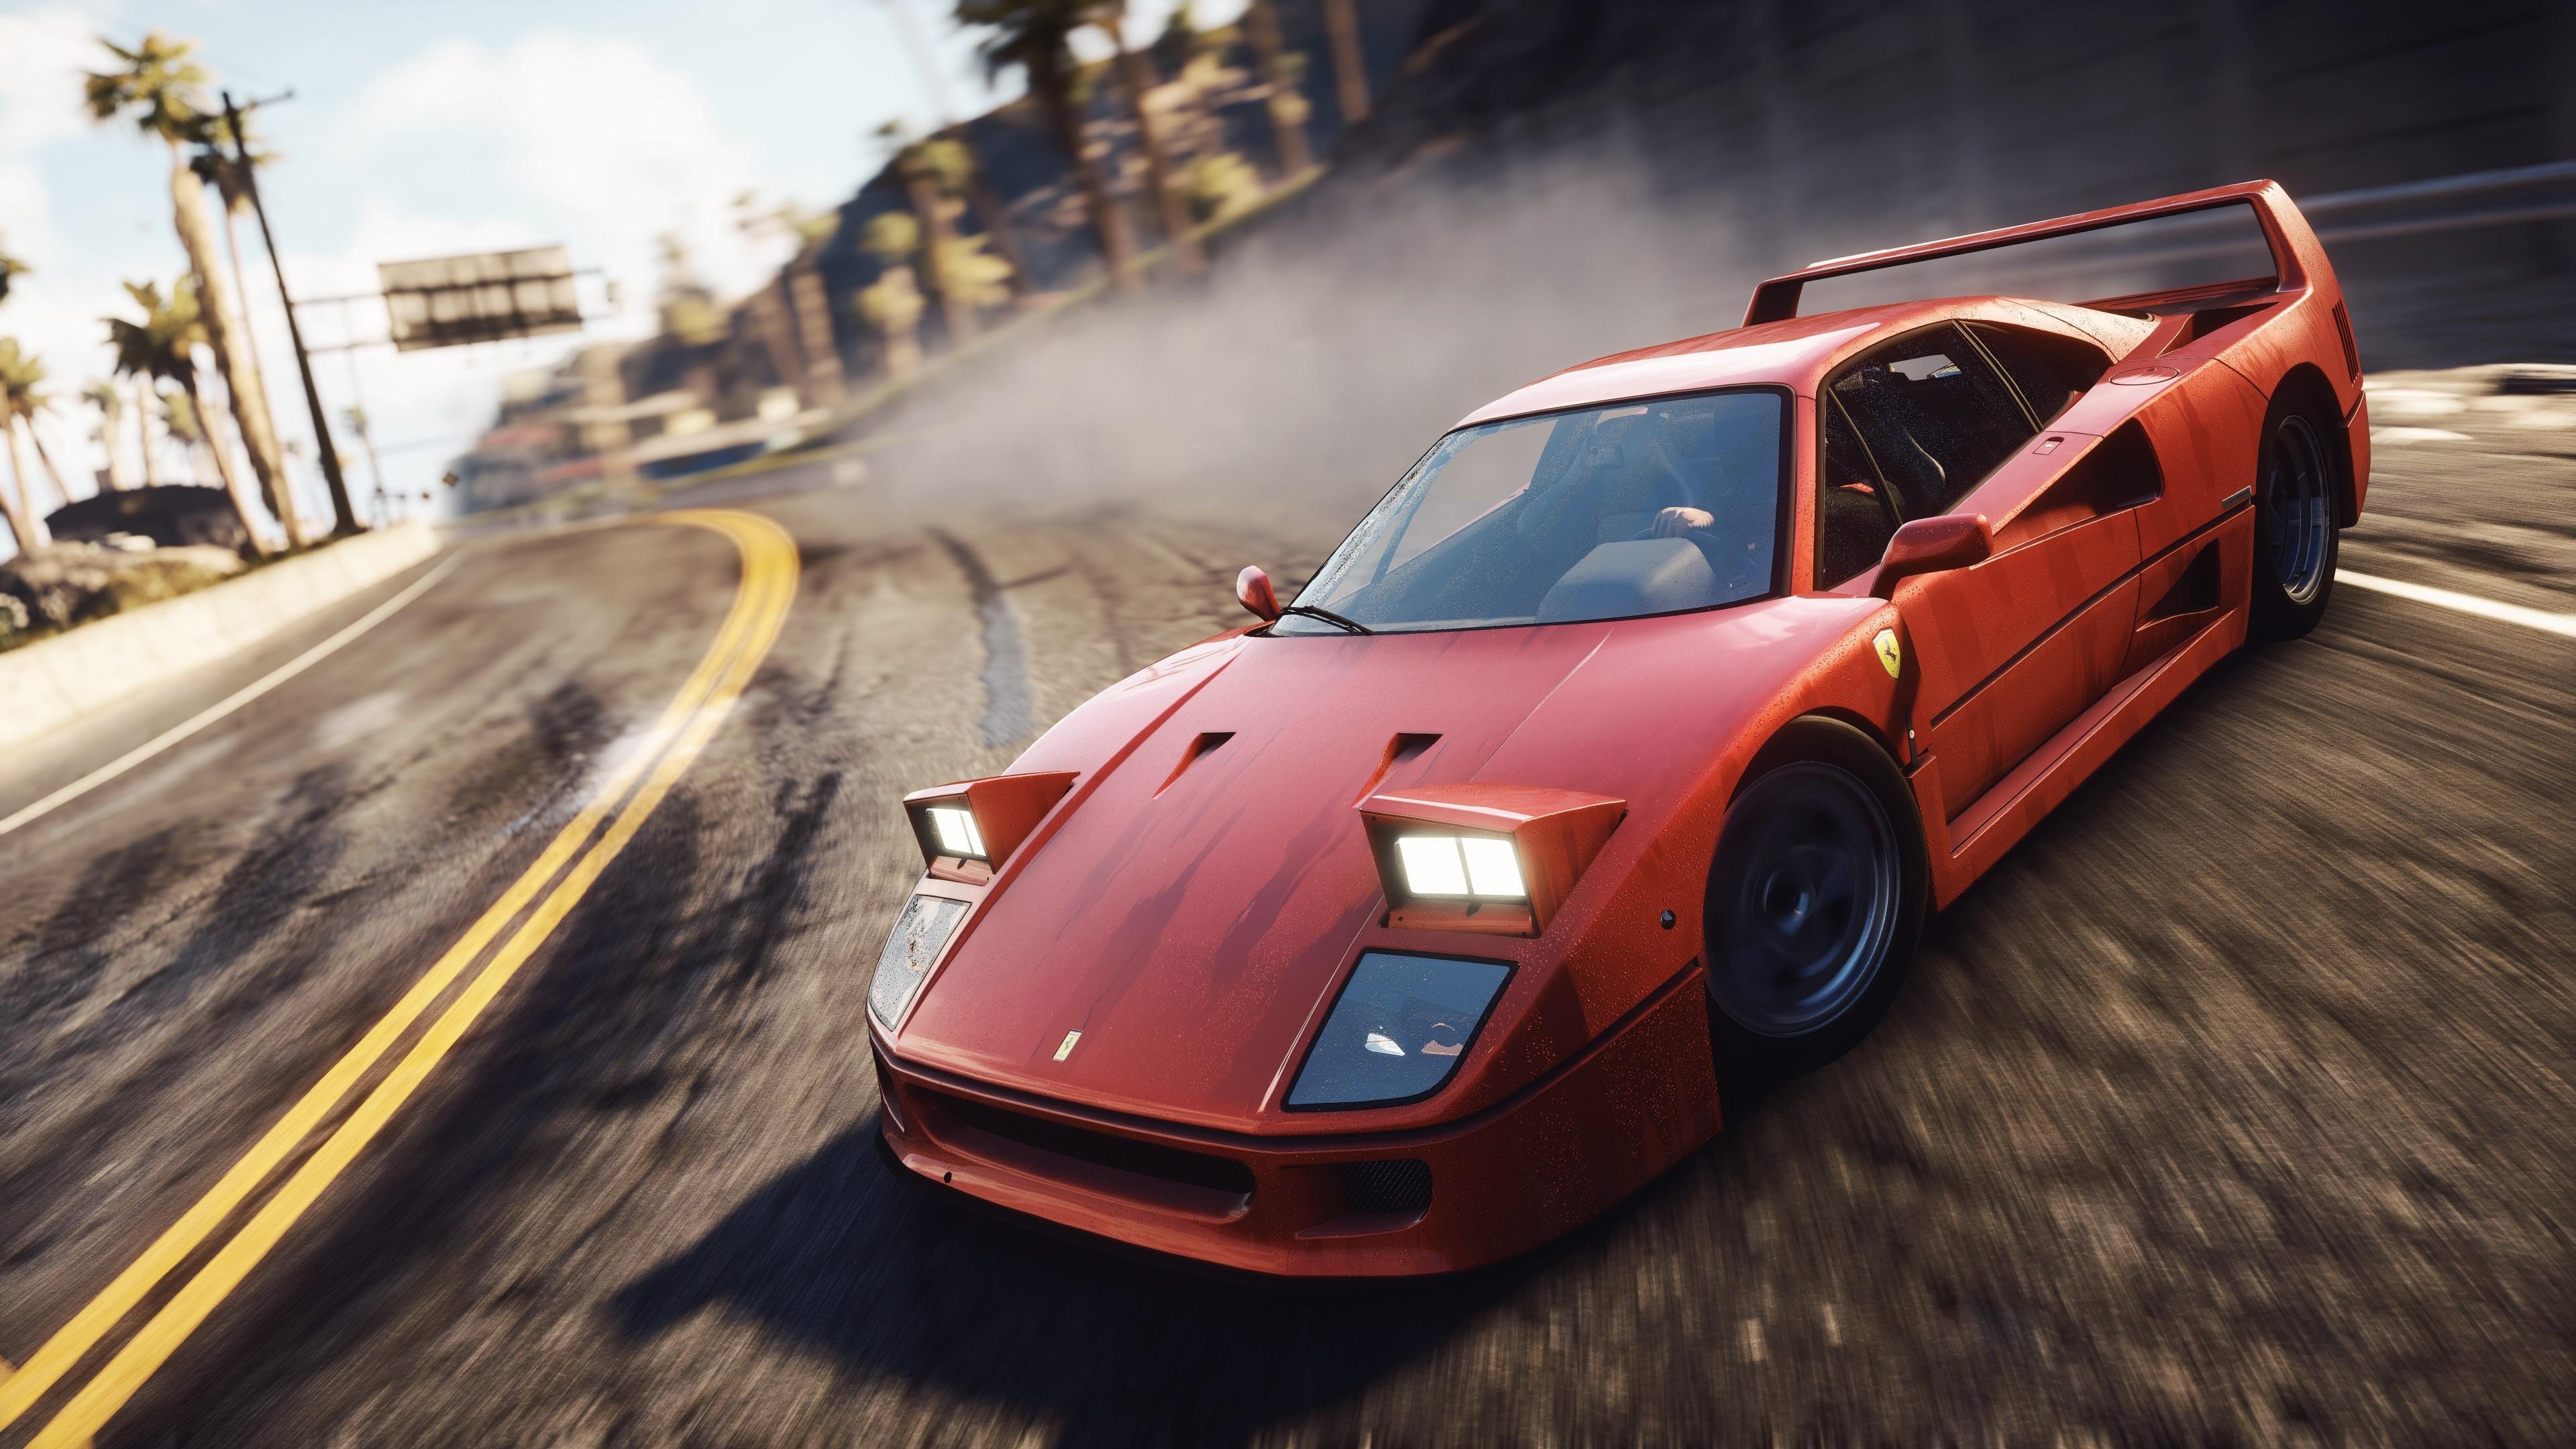 2k Need For Speed Rivals Wallpaper 4k 2099411 Hd